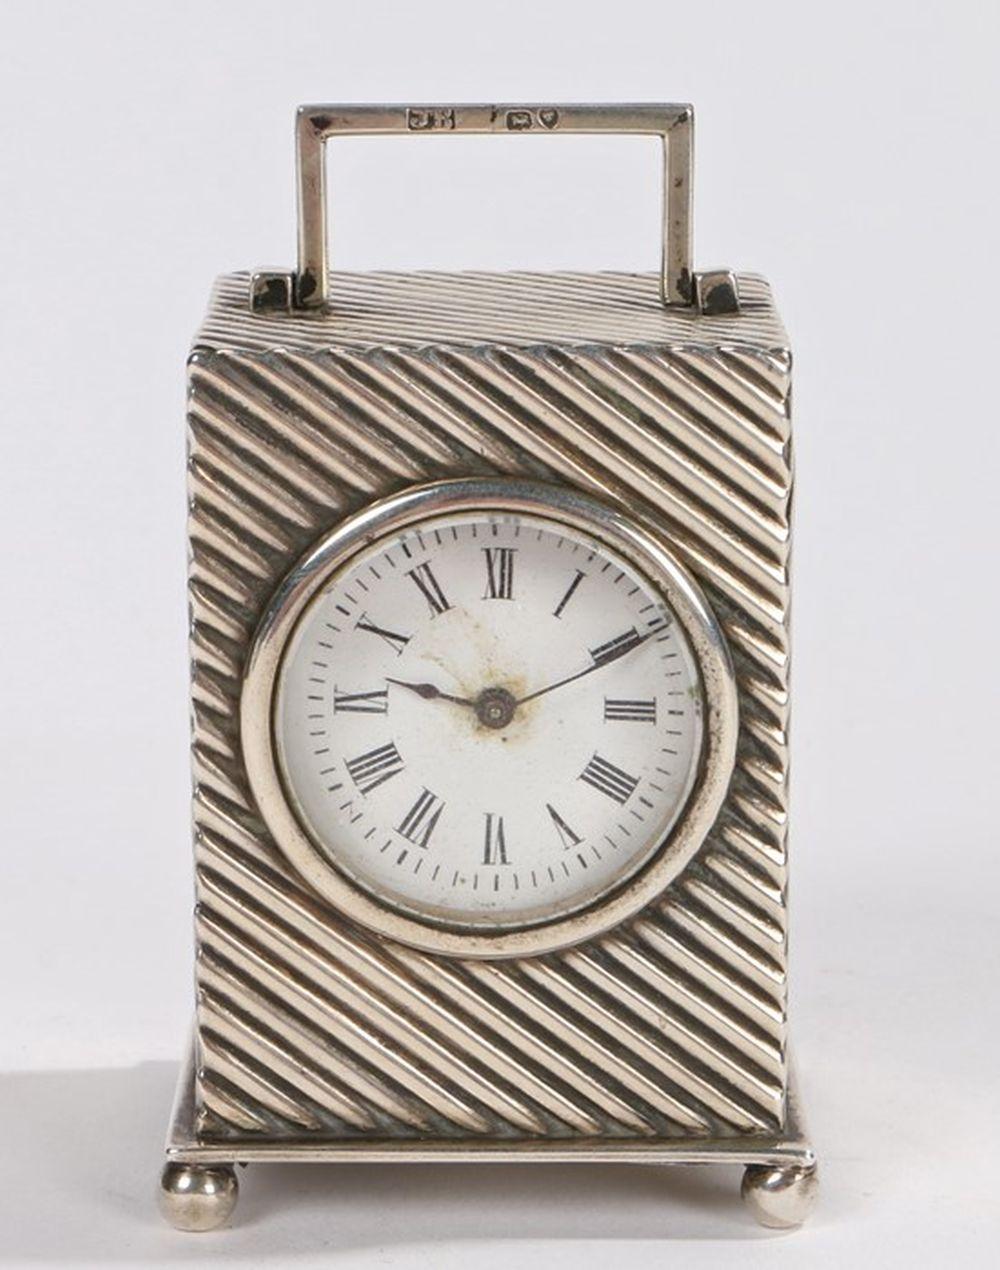 Victorian silver boudoir clock, London 1893, maker JB, with angular swing handle to the horizontal r